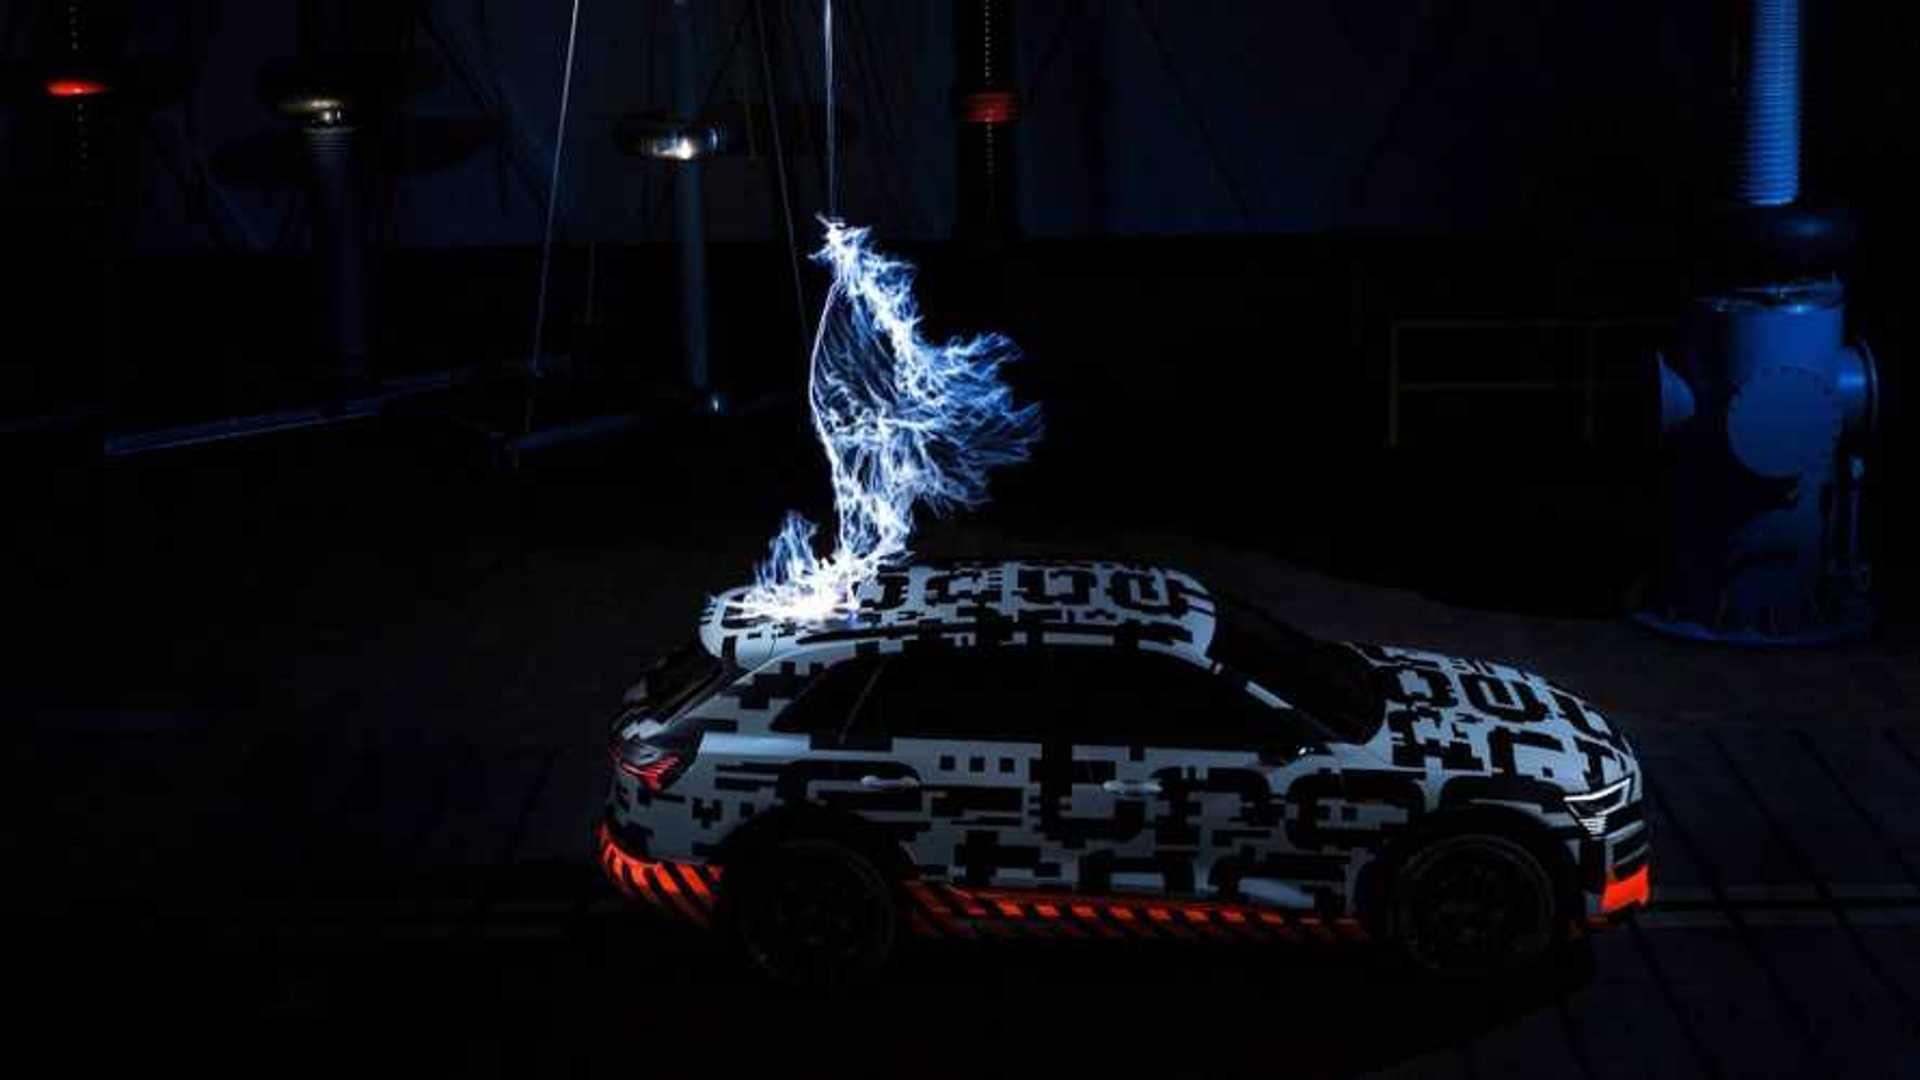 Update E Tron Priced German Ev Wave Audi Vs Mercedes Eqc Bmw Inext